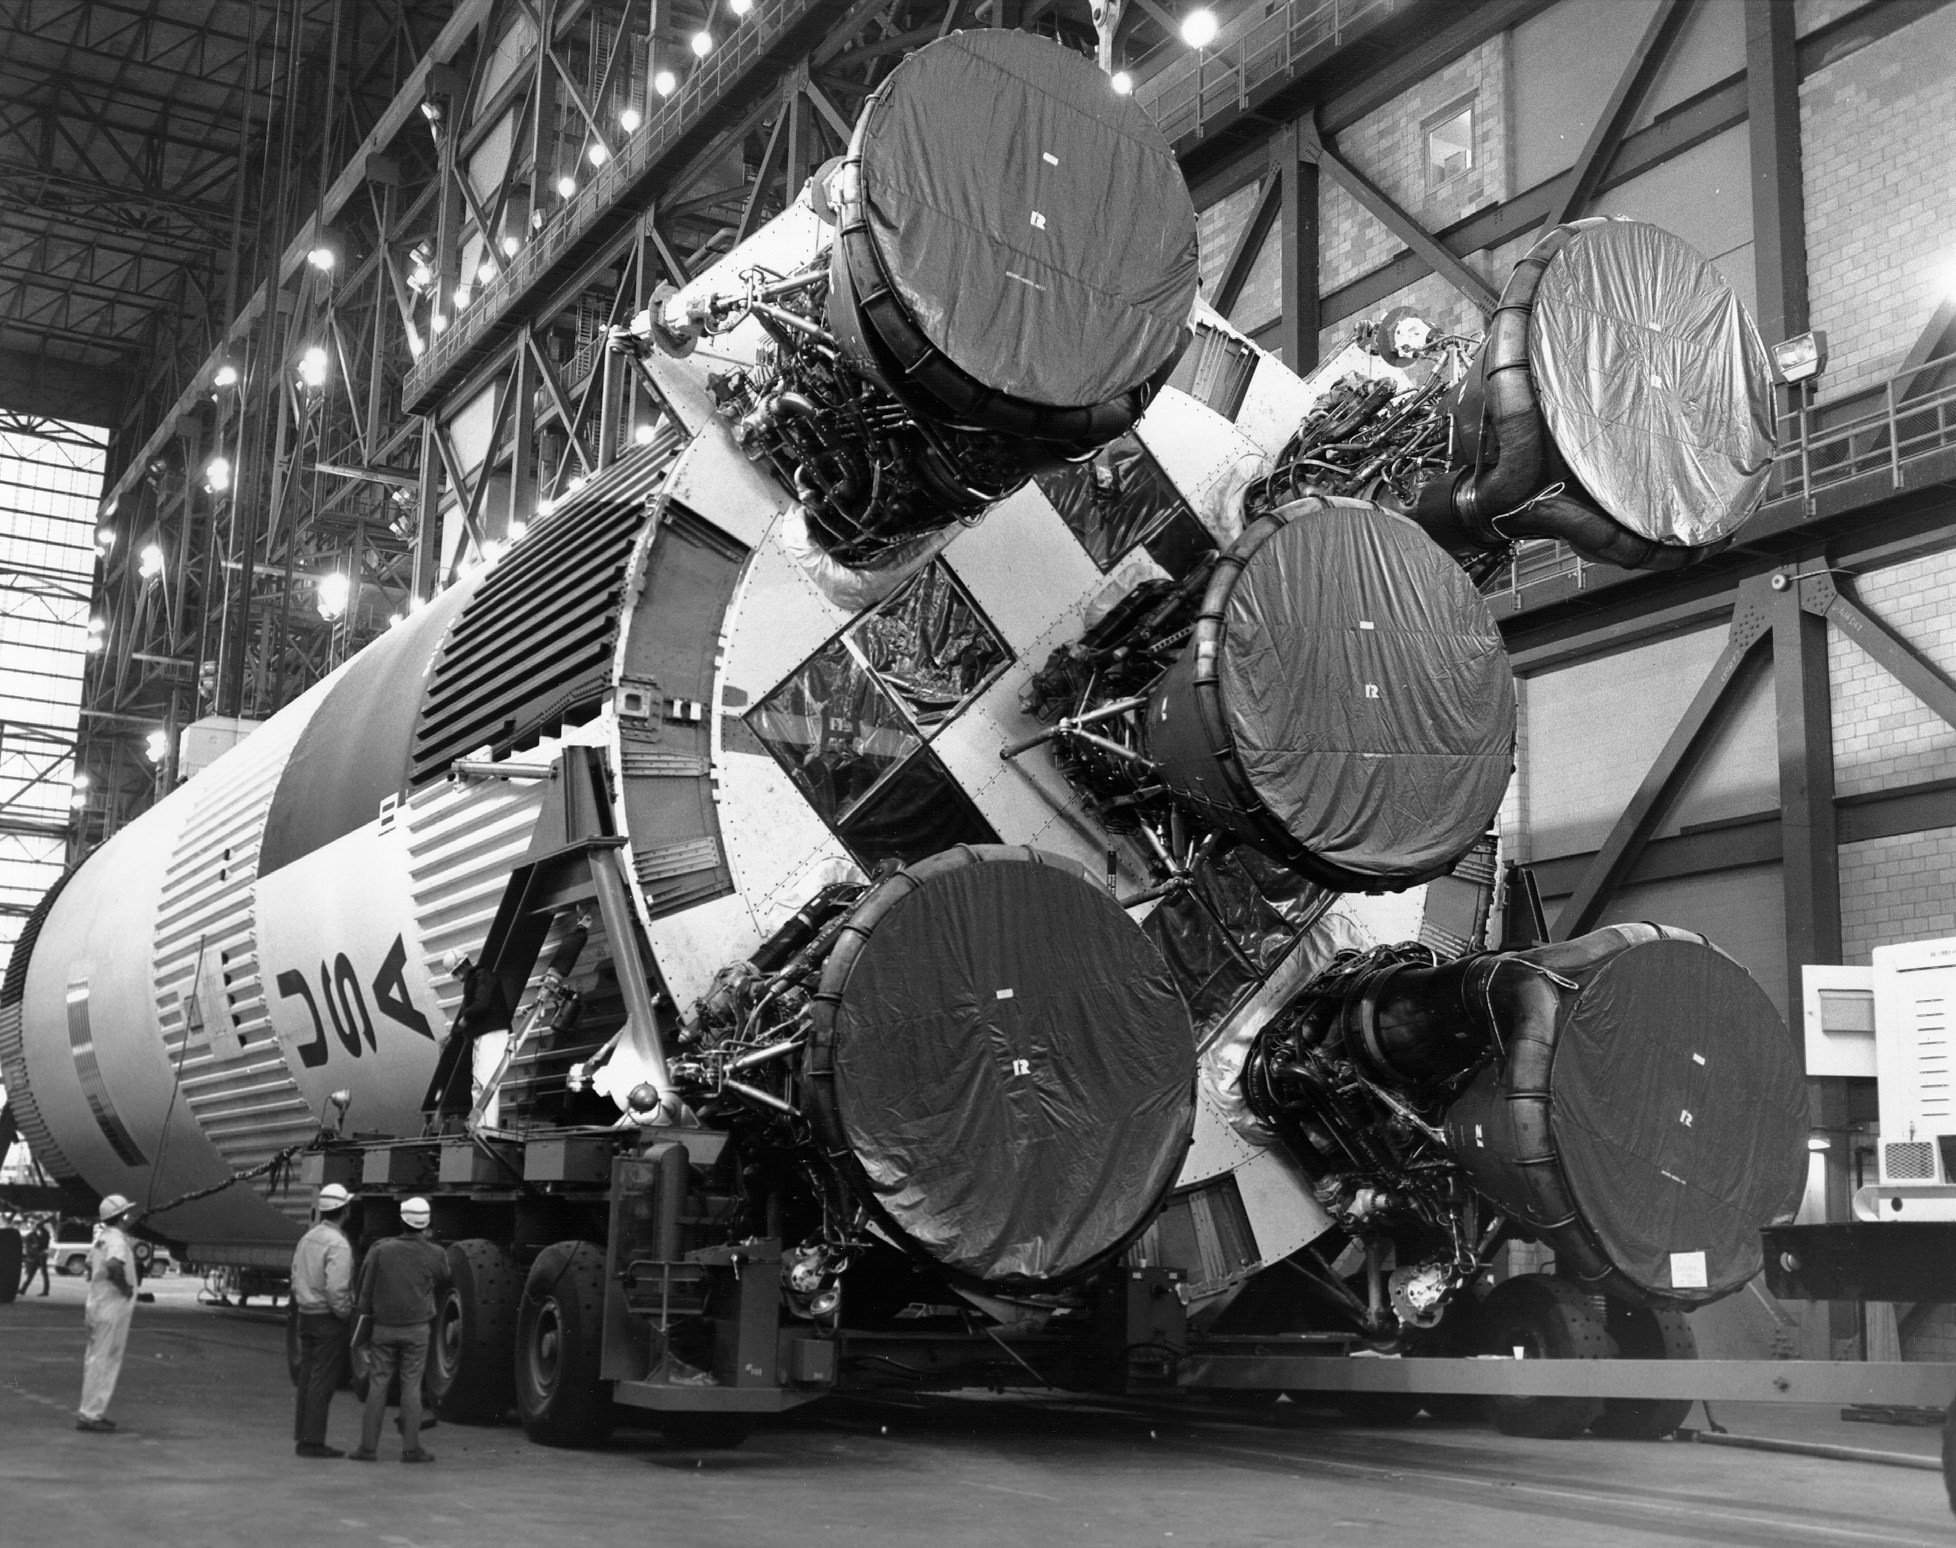 Amazon Founder Finds Apollo 11 Moon Rocket Engines On Ocean Floor